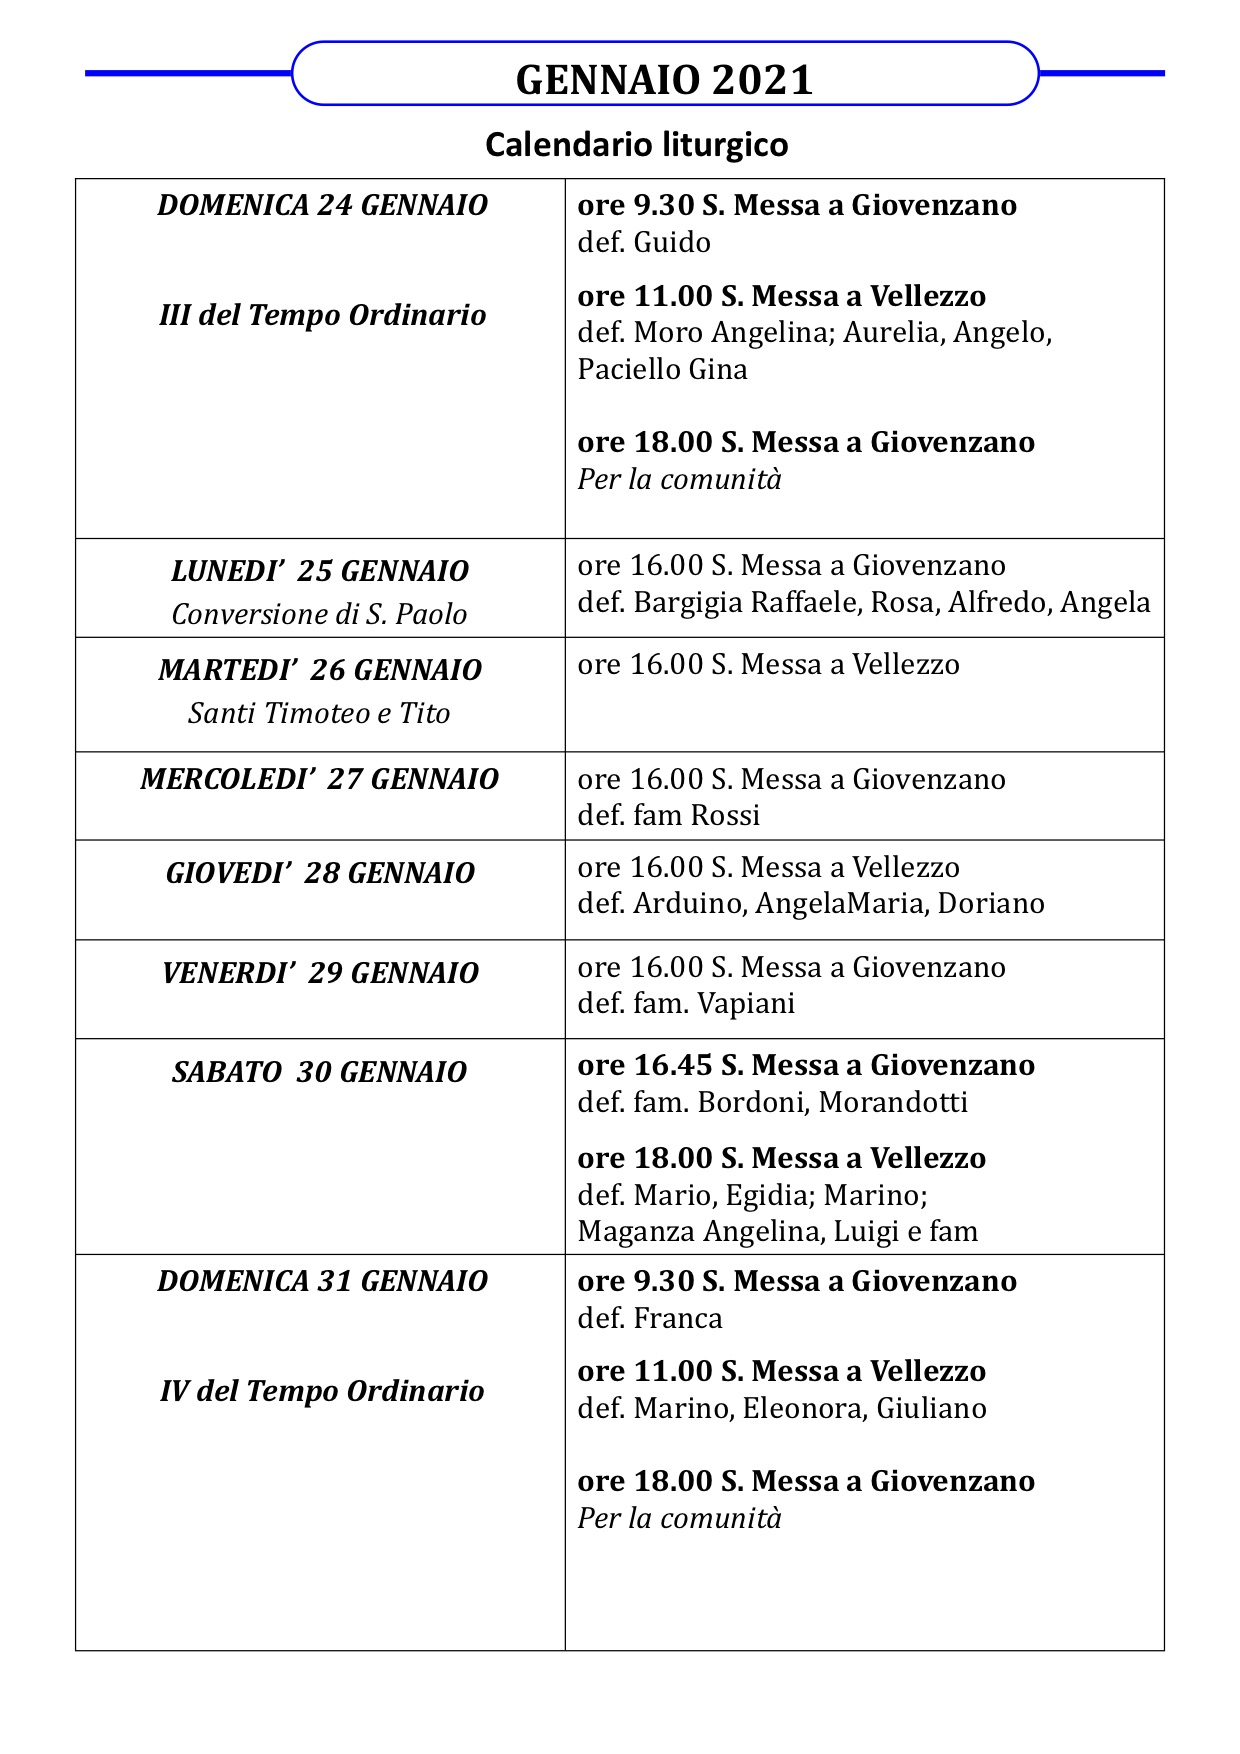 Calendario liturgico dal 24 al 31 gennaio 2021